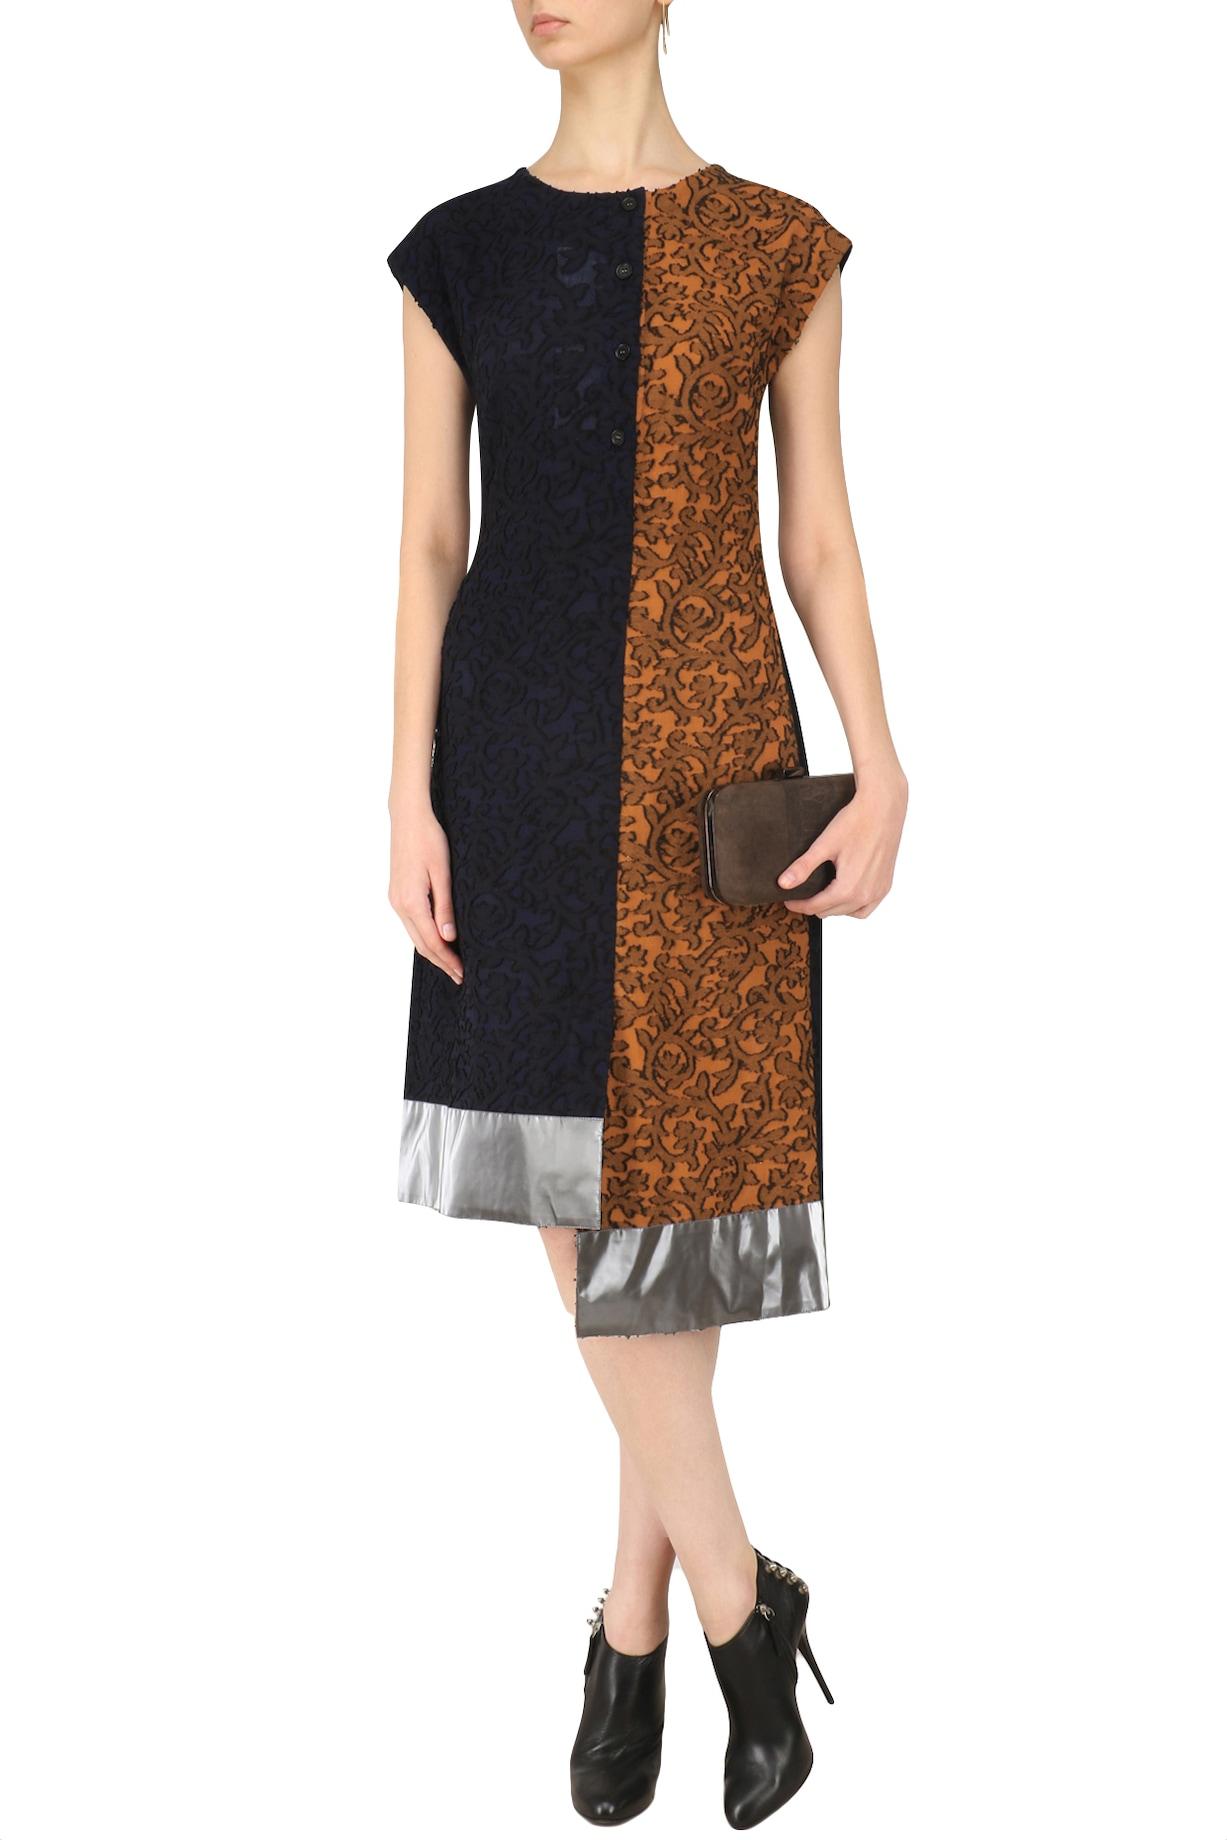 Dhruv Kapoor Dresses